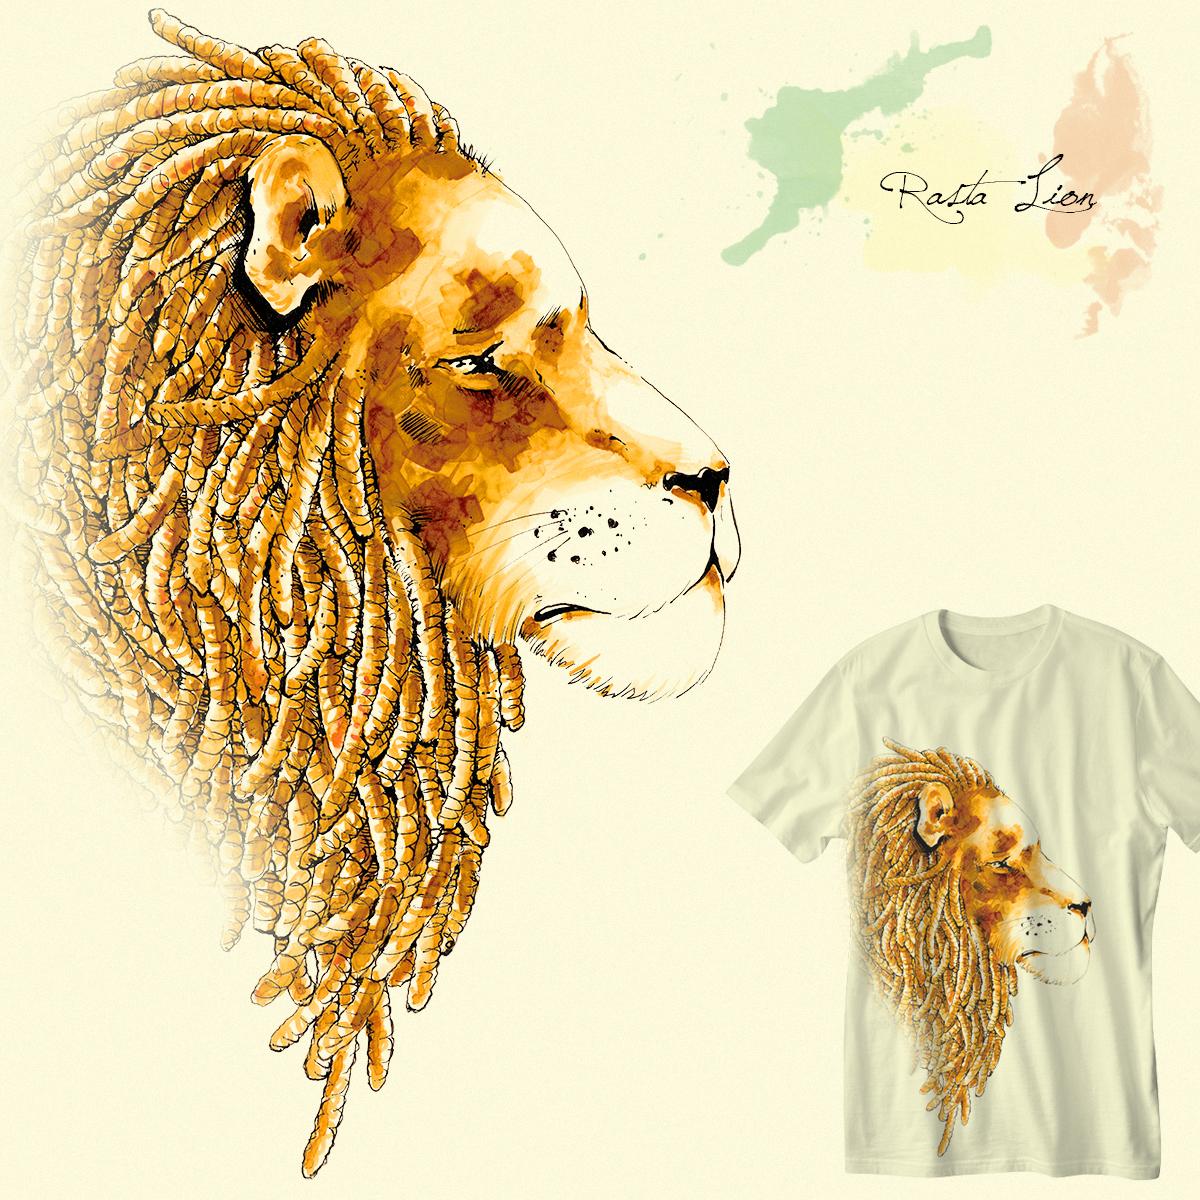 Rasta Lion by Shory on Threadless